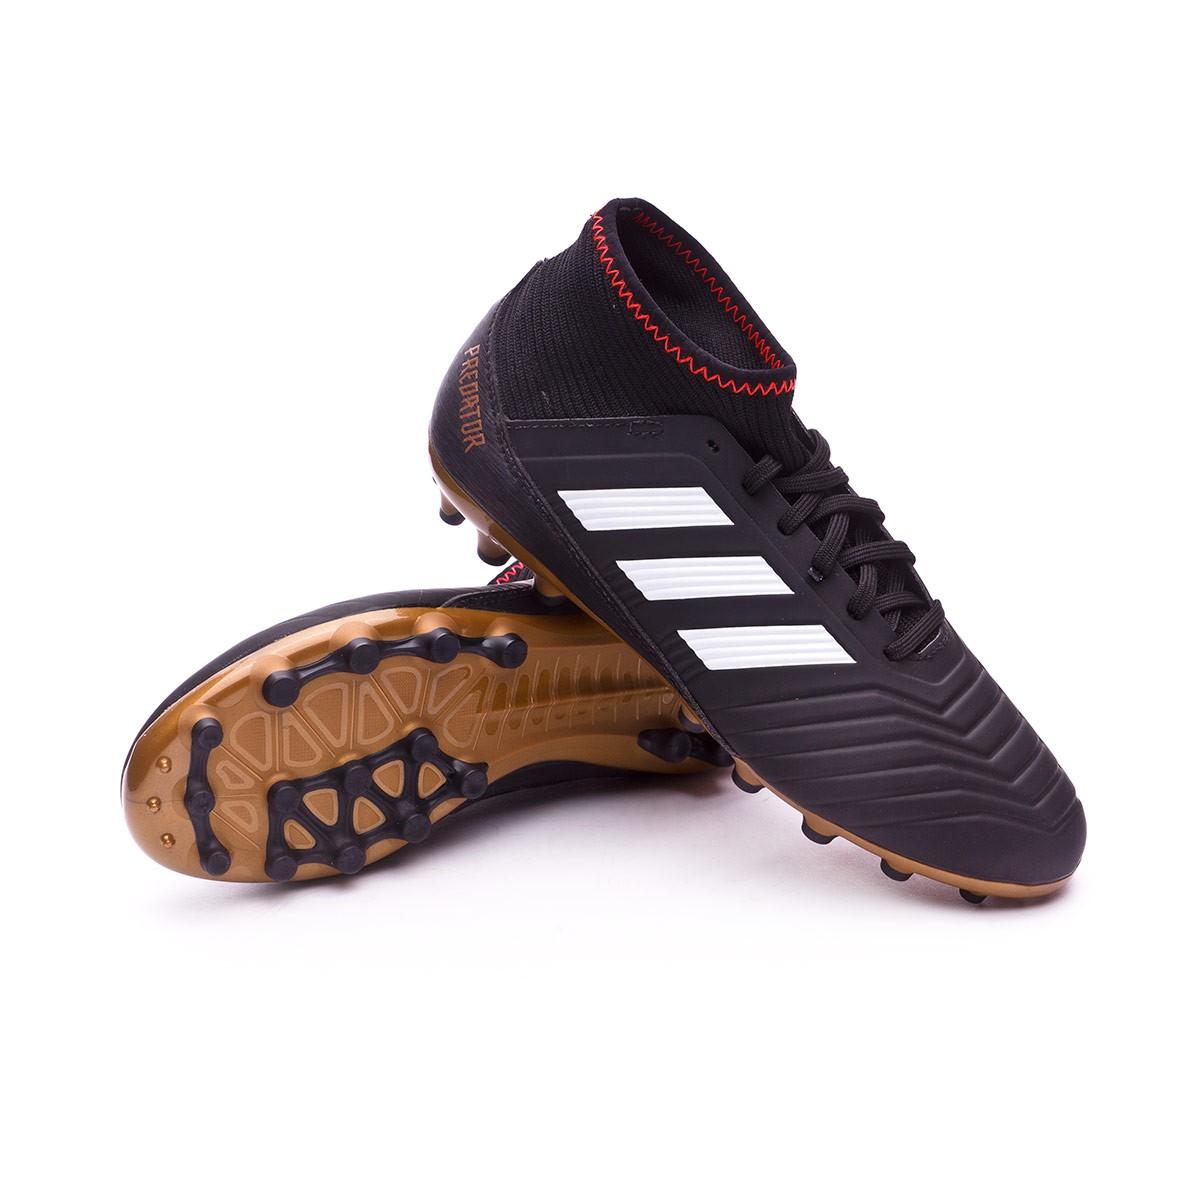 detailed look 085e3 dd2e0 adidas Kids Predator 18.3 AG Football Boots